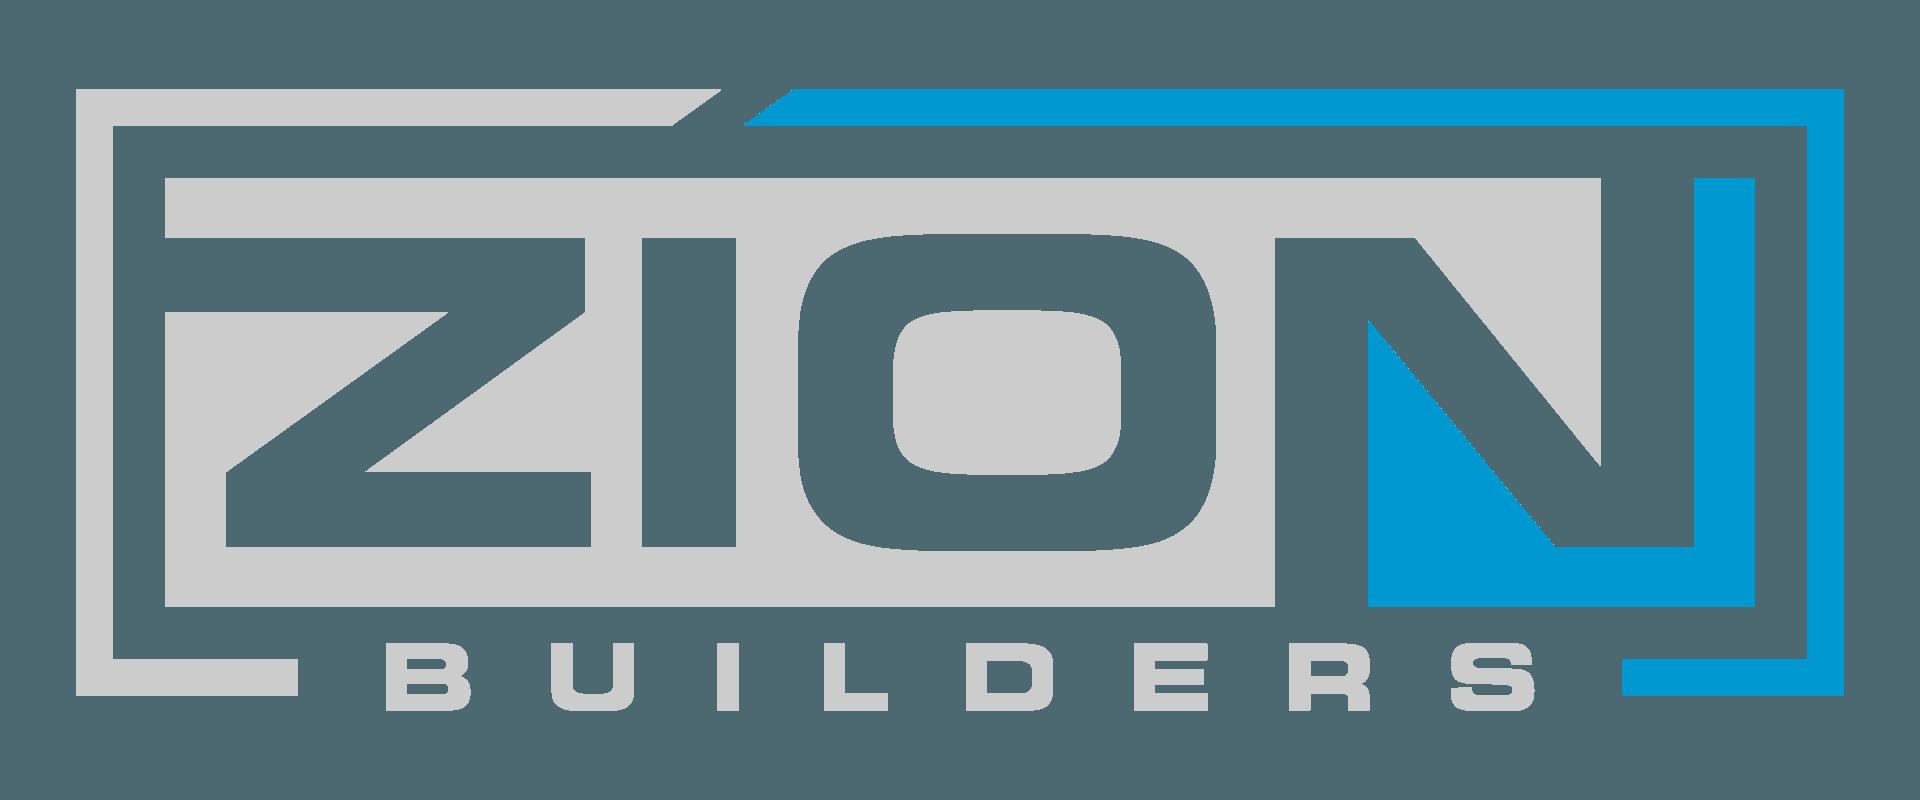 Wood Art Construction LLC logo